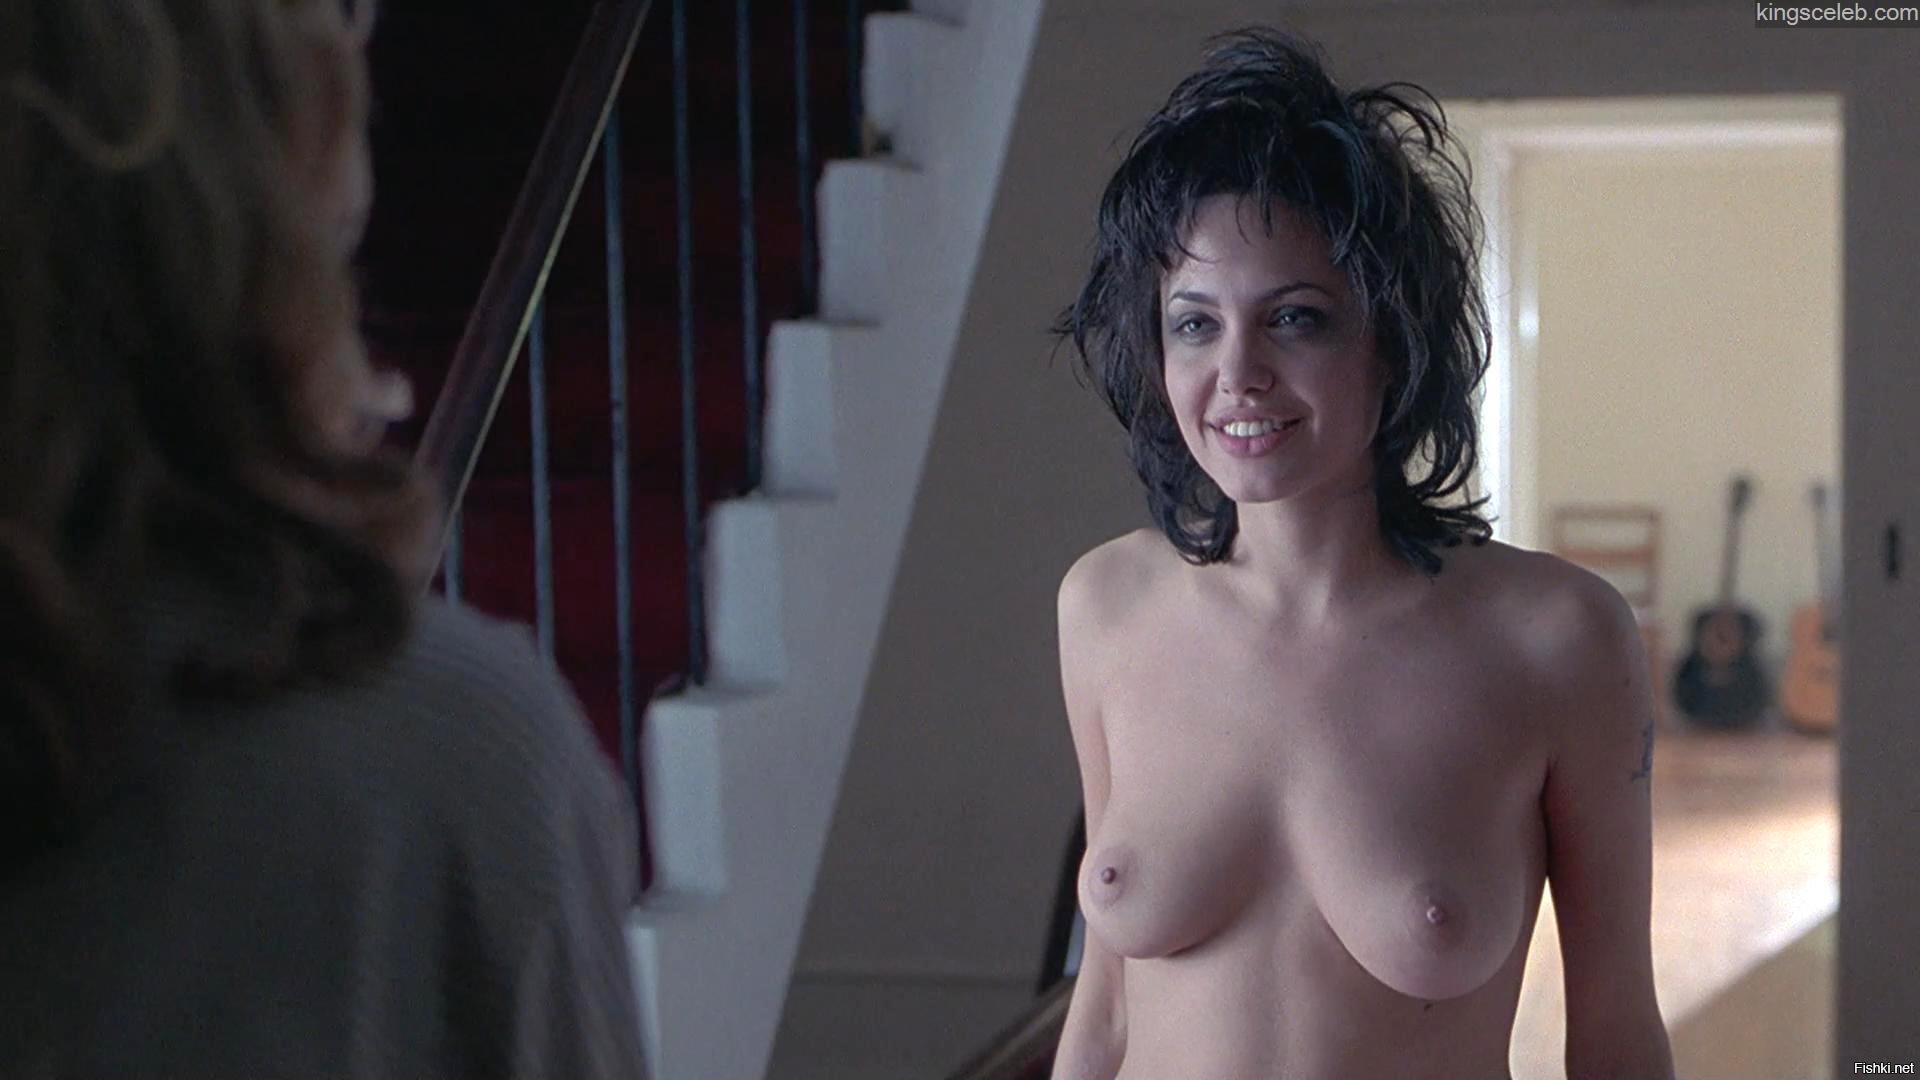 Photo of angelina jolie half nude from films, black pimp girls